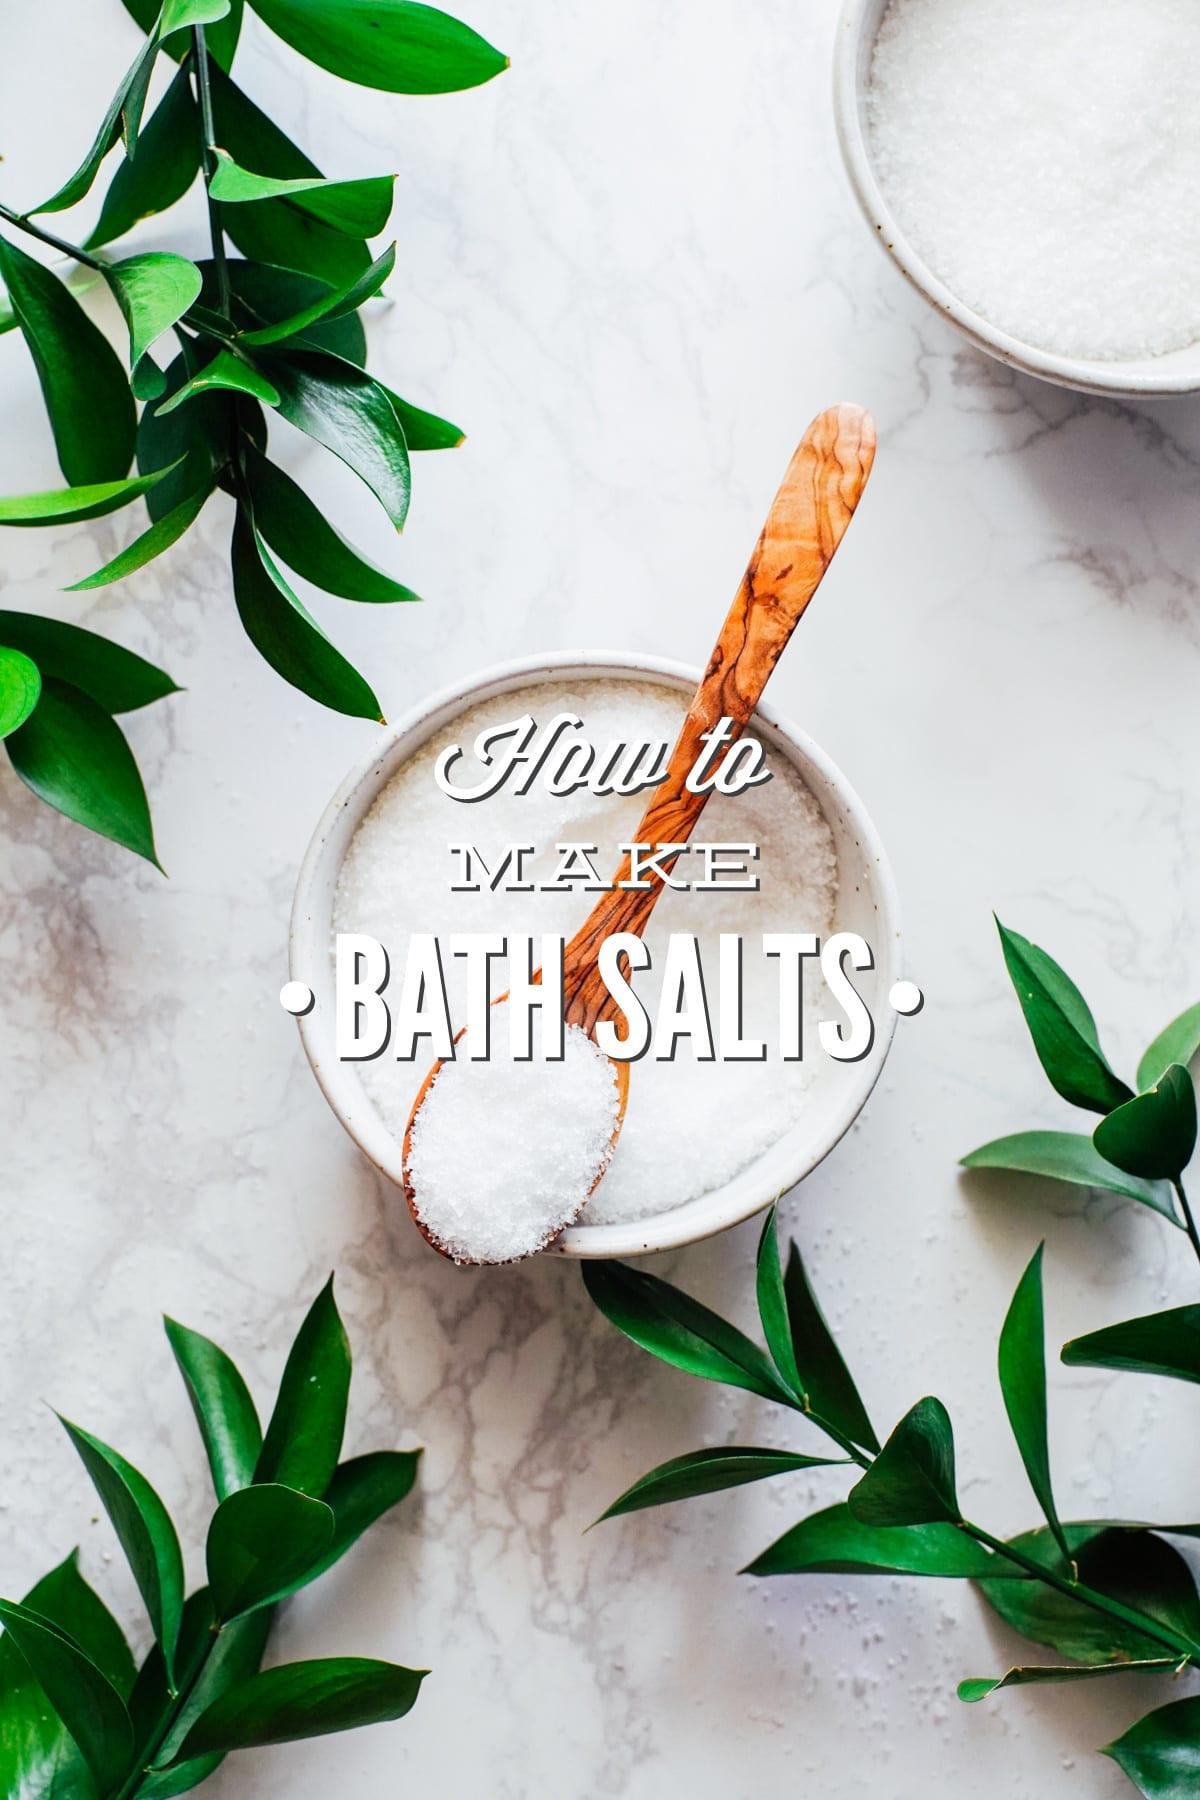 Bath Salt Guide: How to Make Homemade Bath Salts